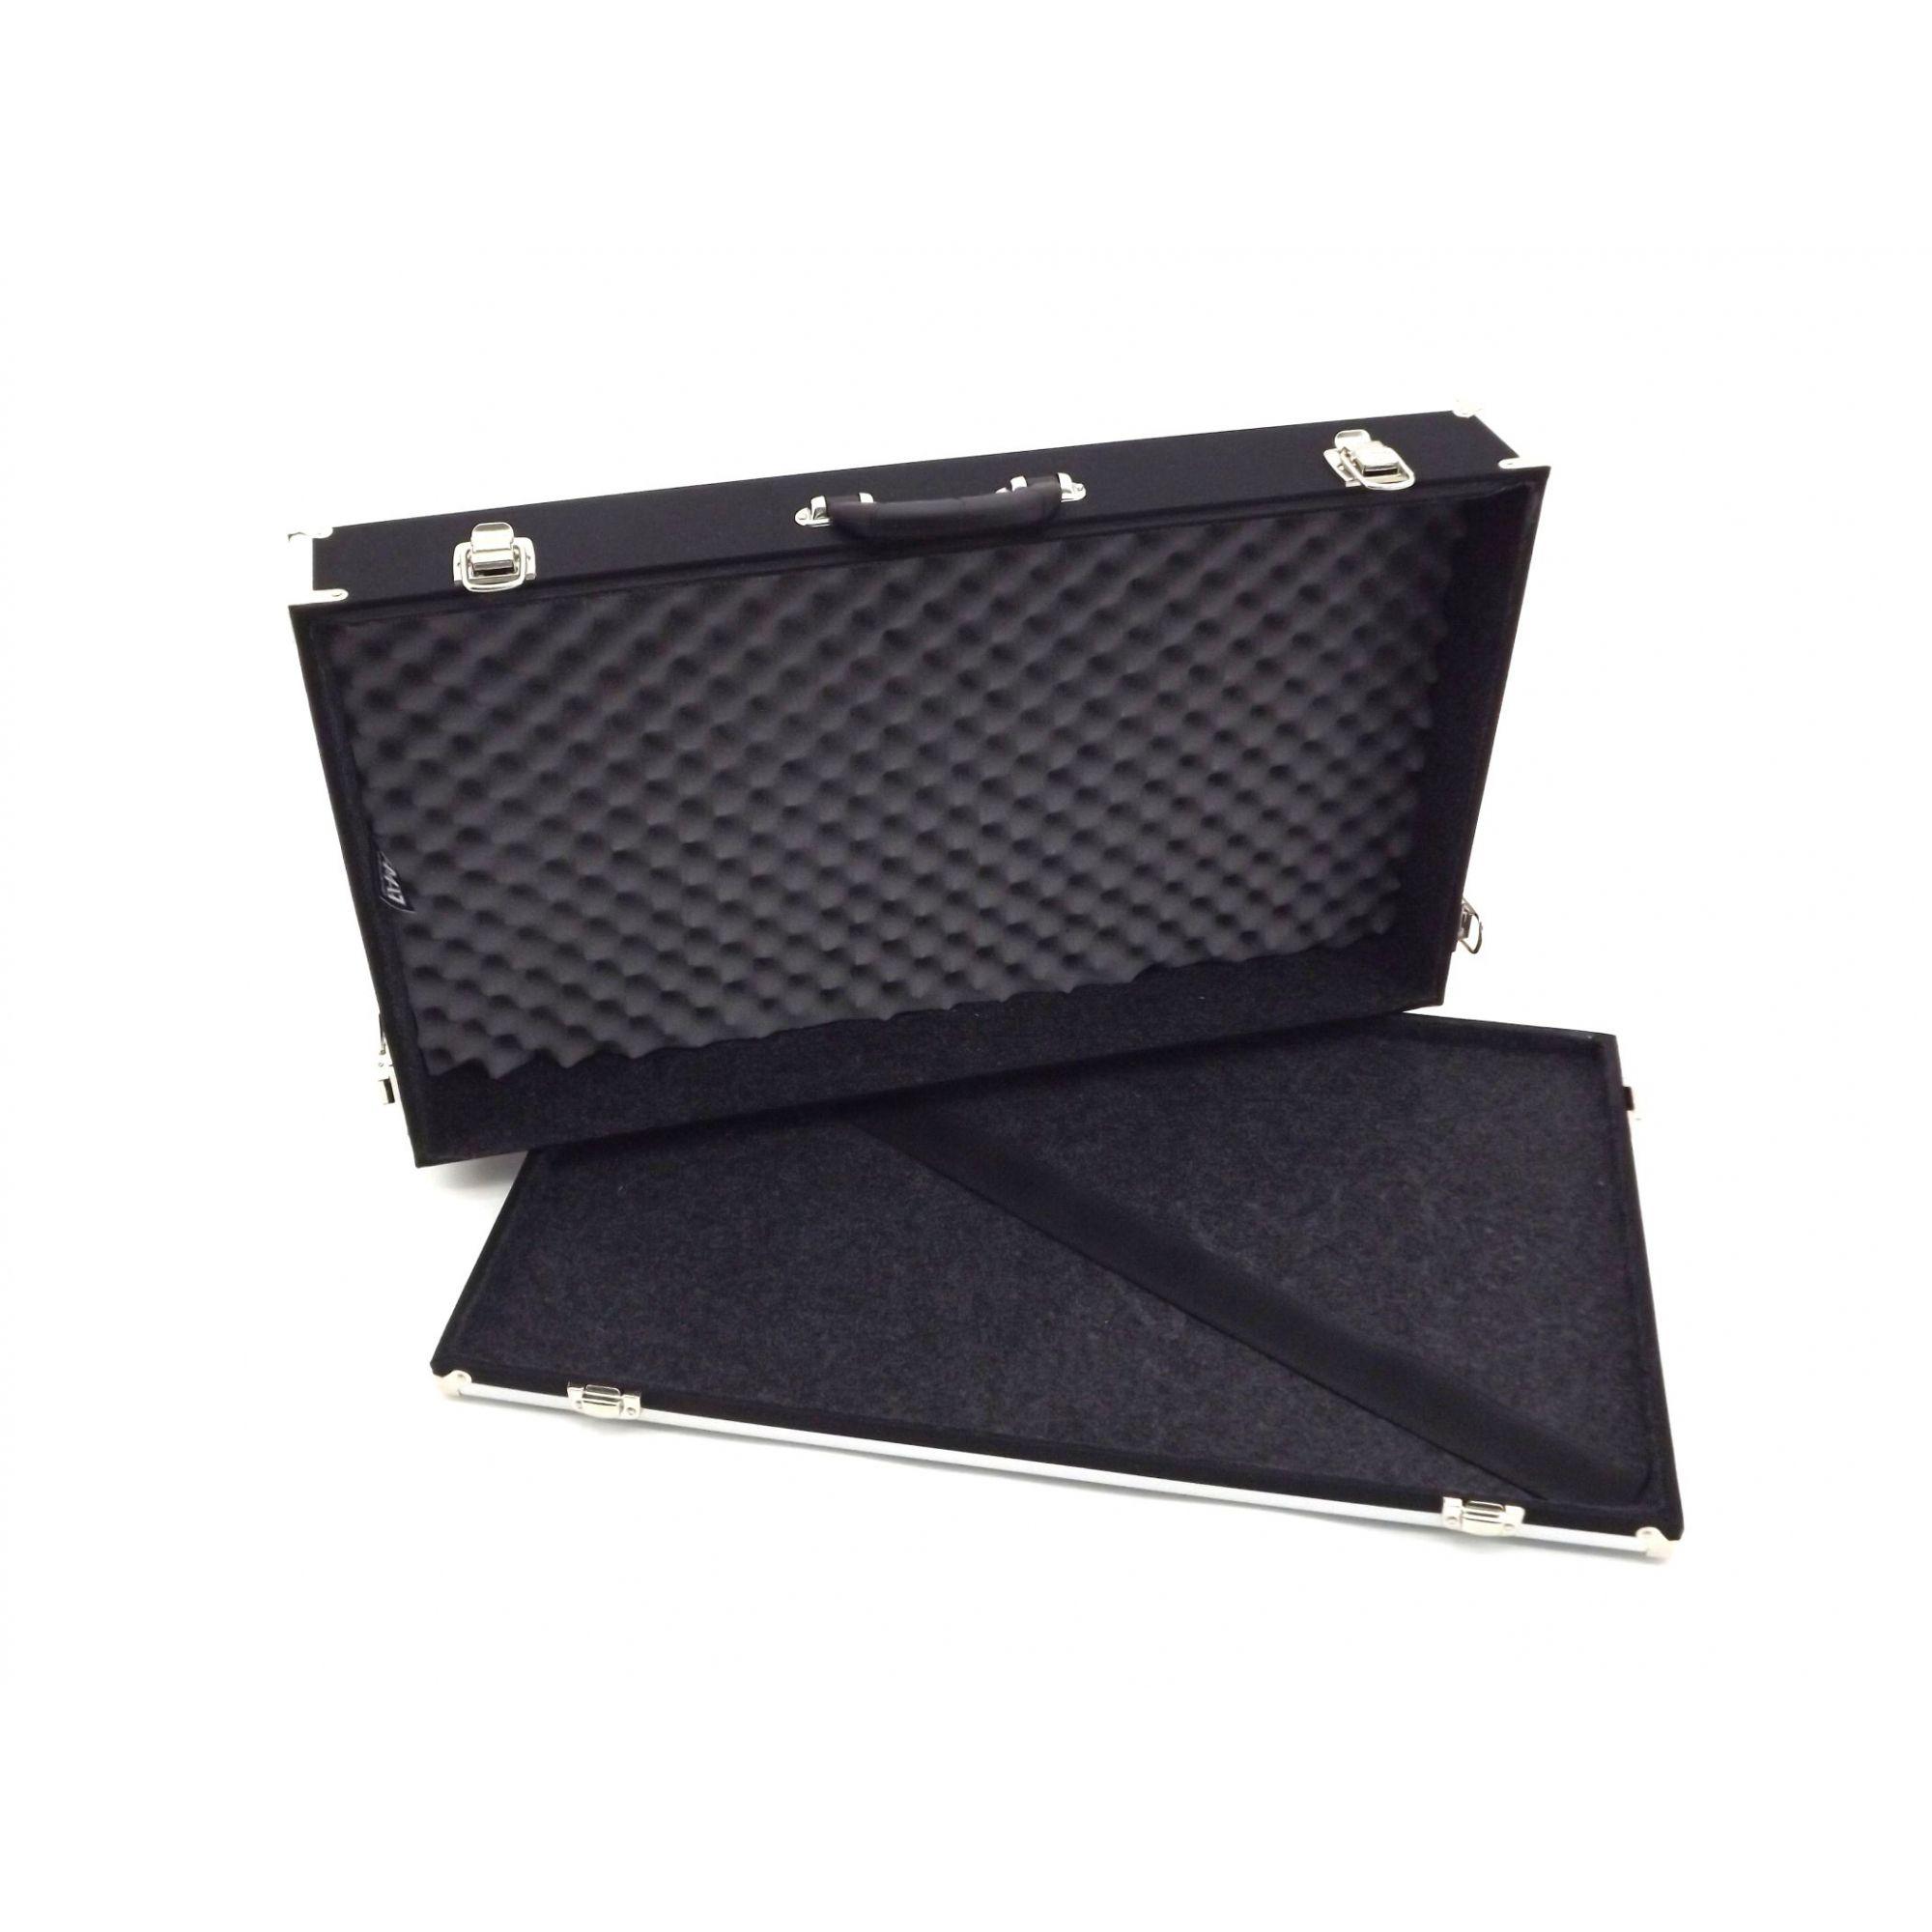 Case Pedais Pedaleira 60x35x10cm Super Luxo